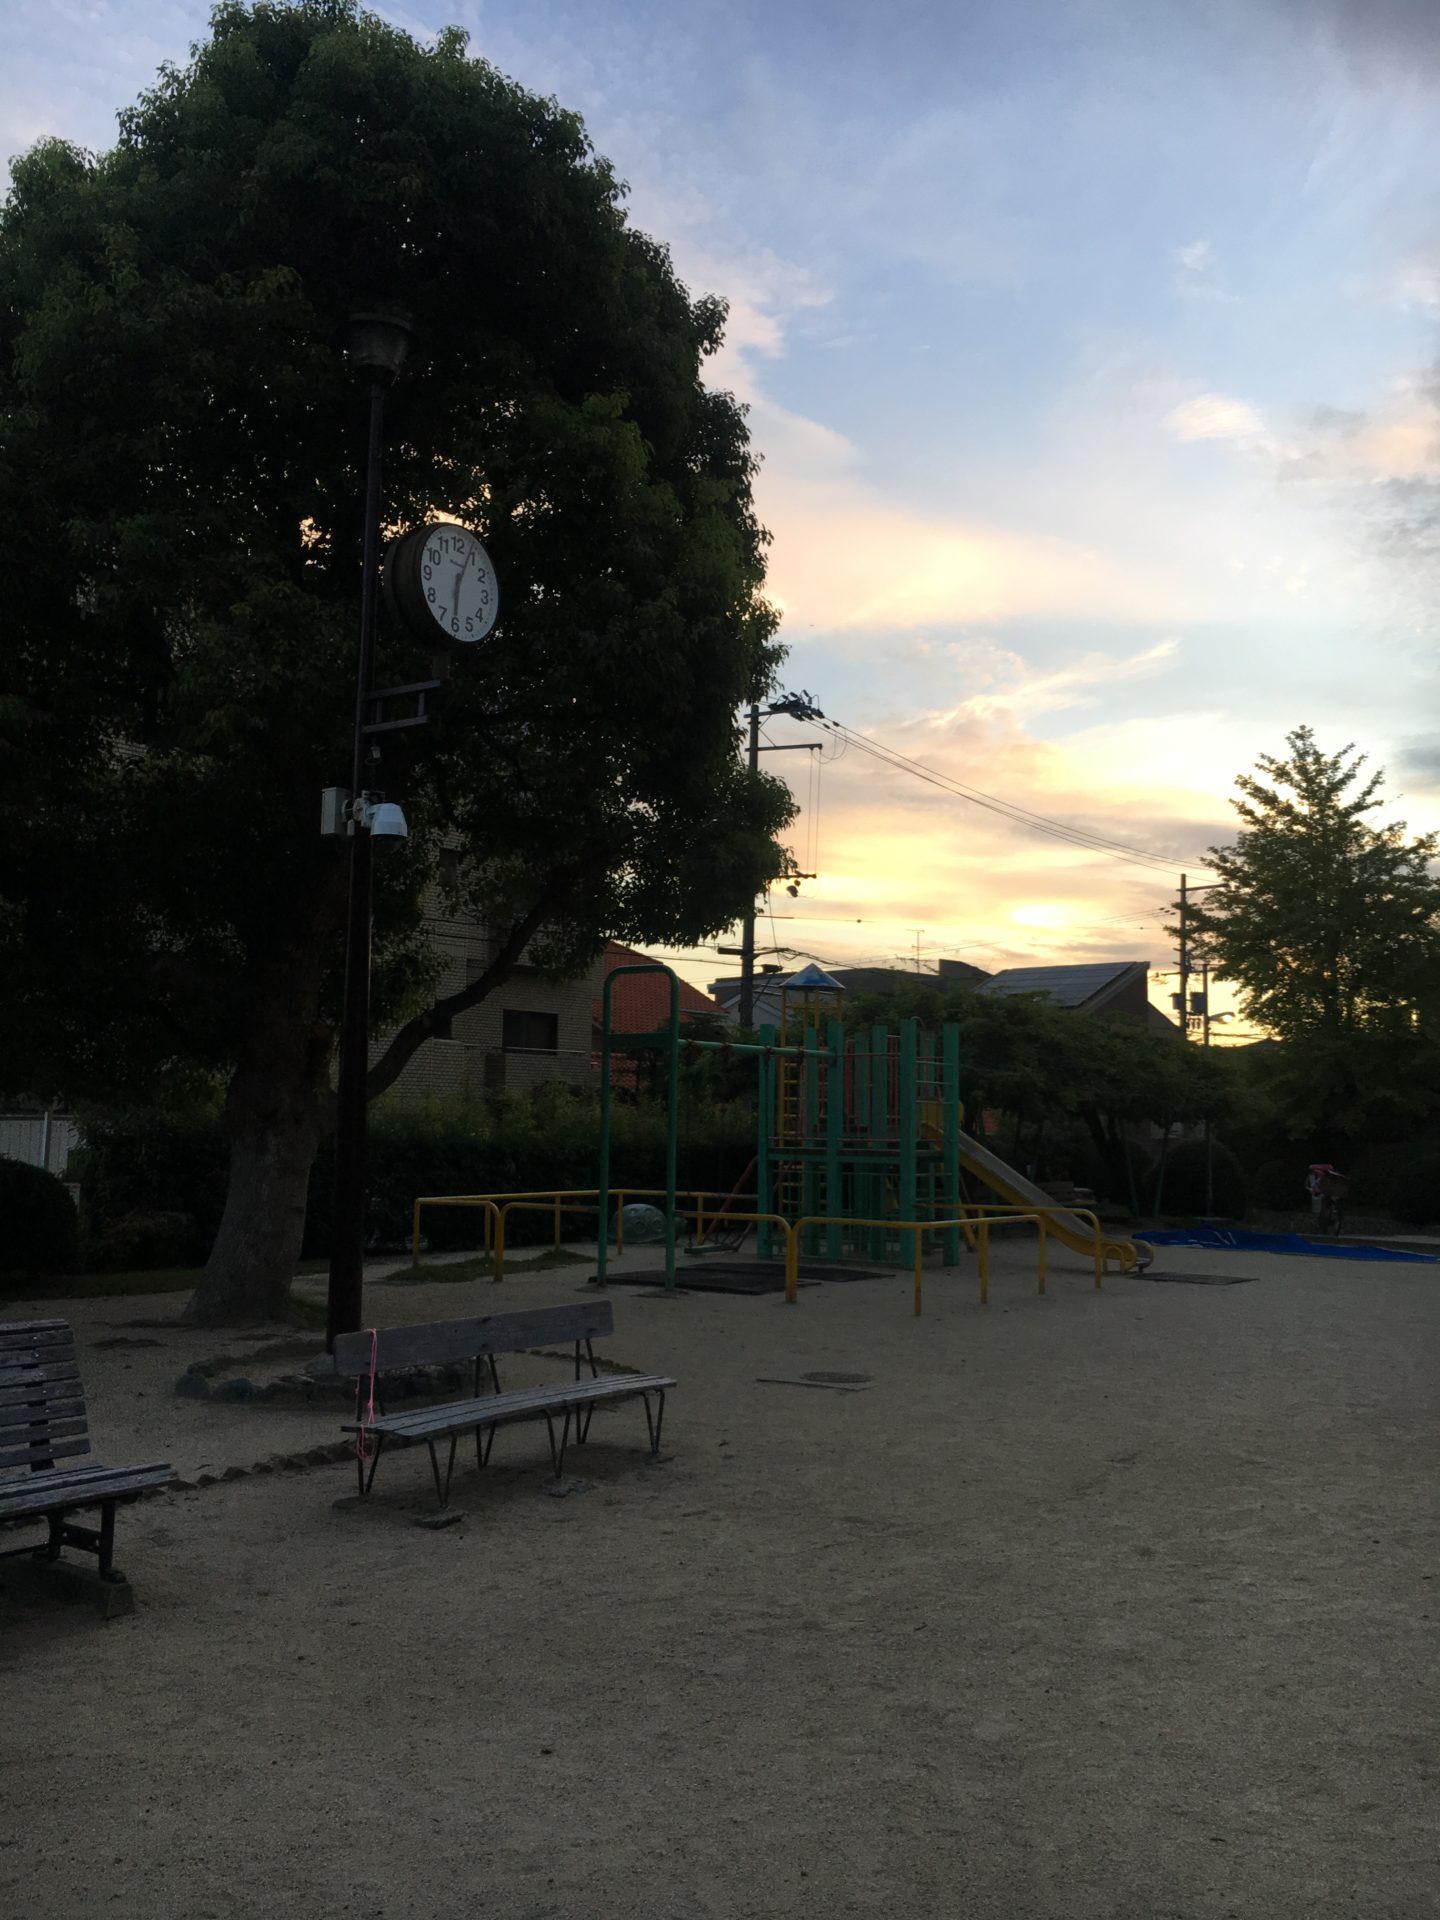 18時頃の公園